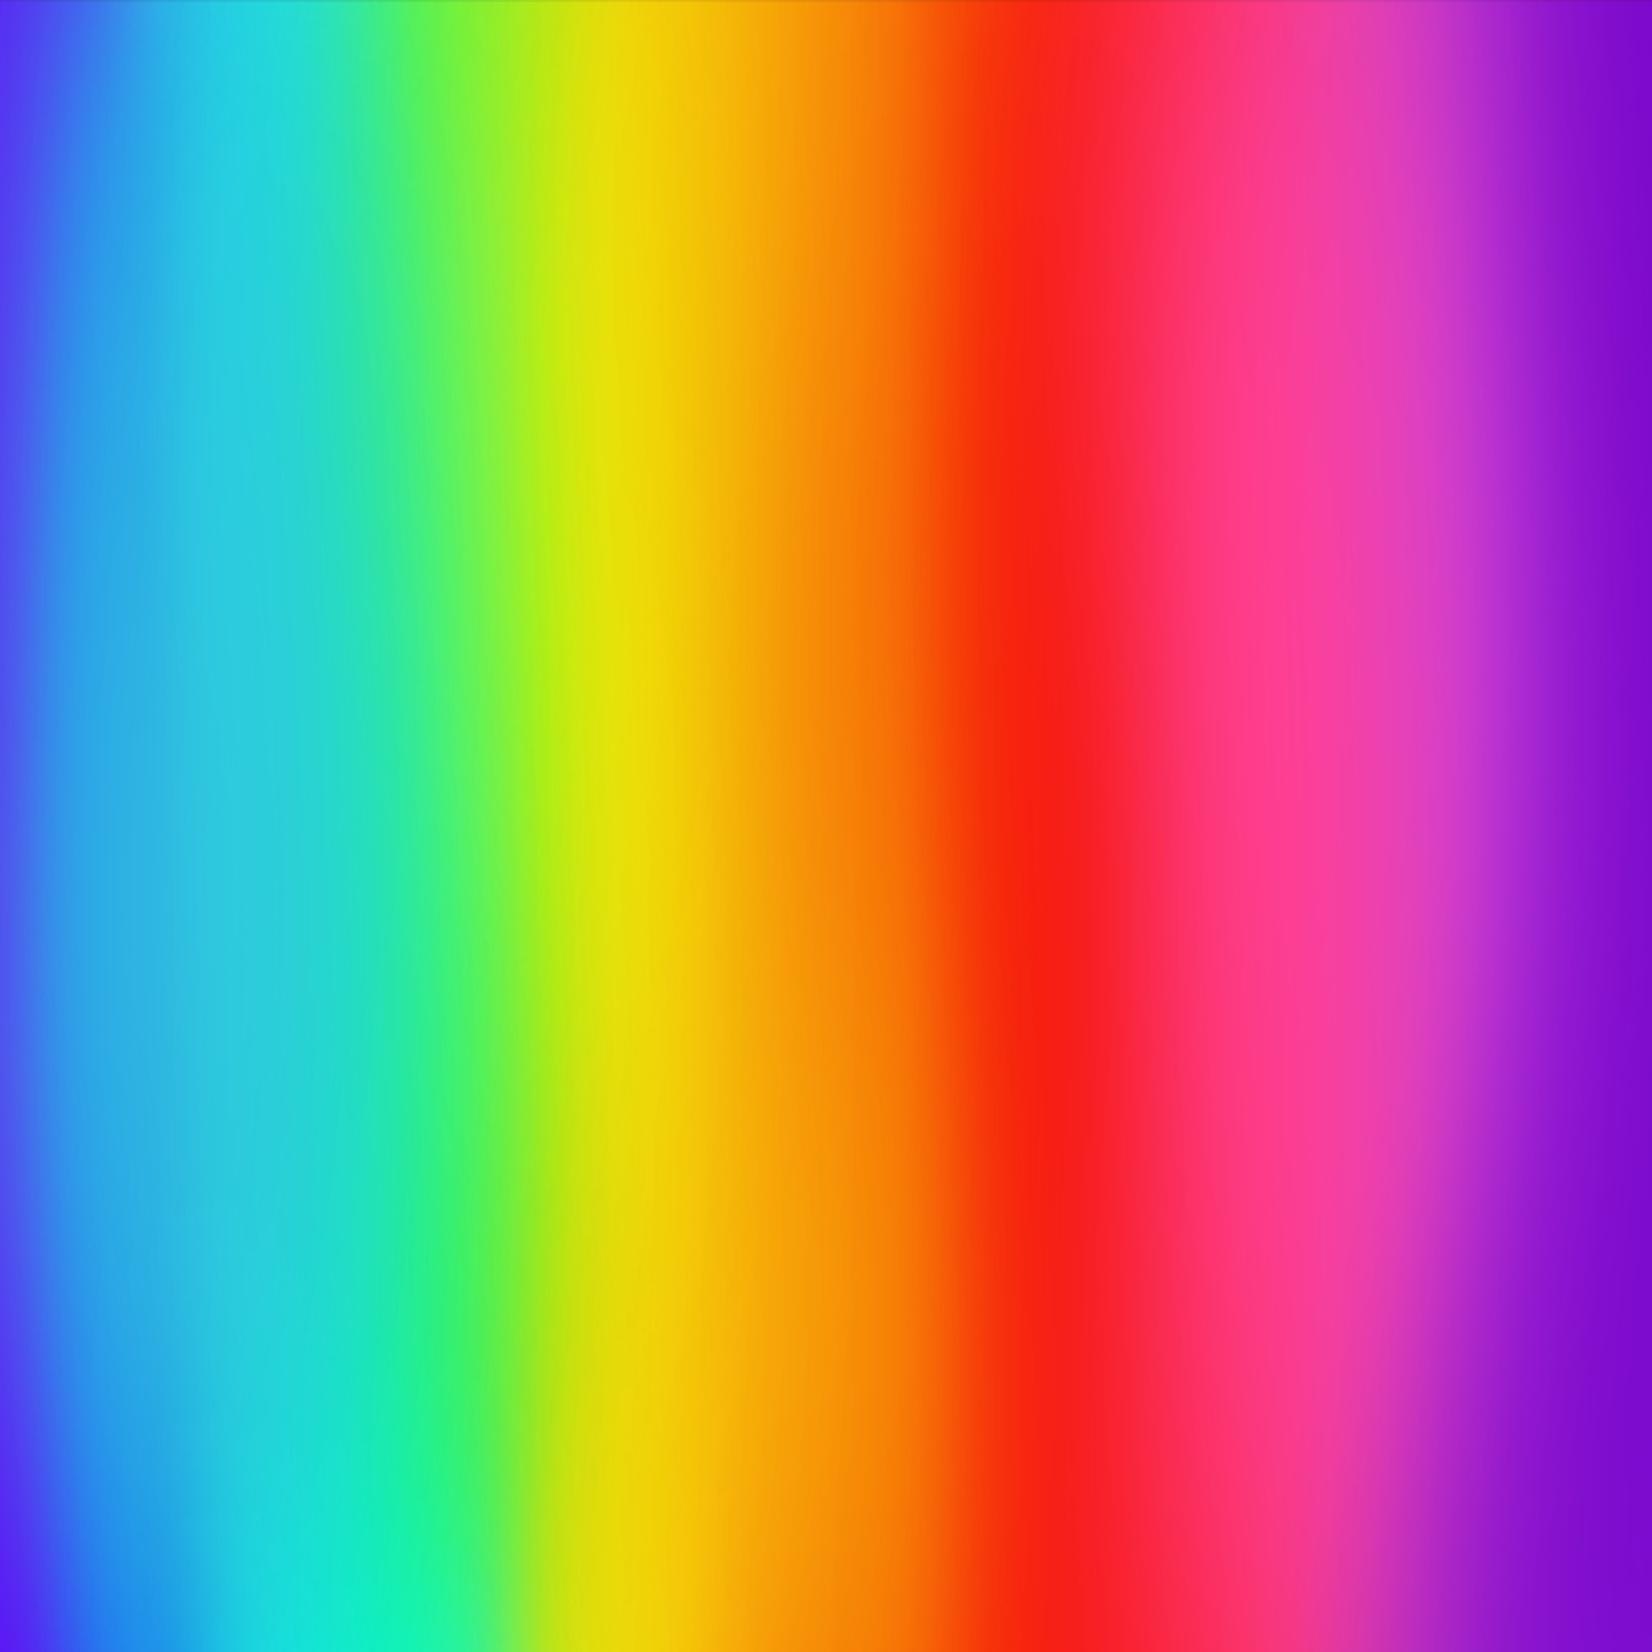 TVD Rainbow Ombre